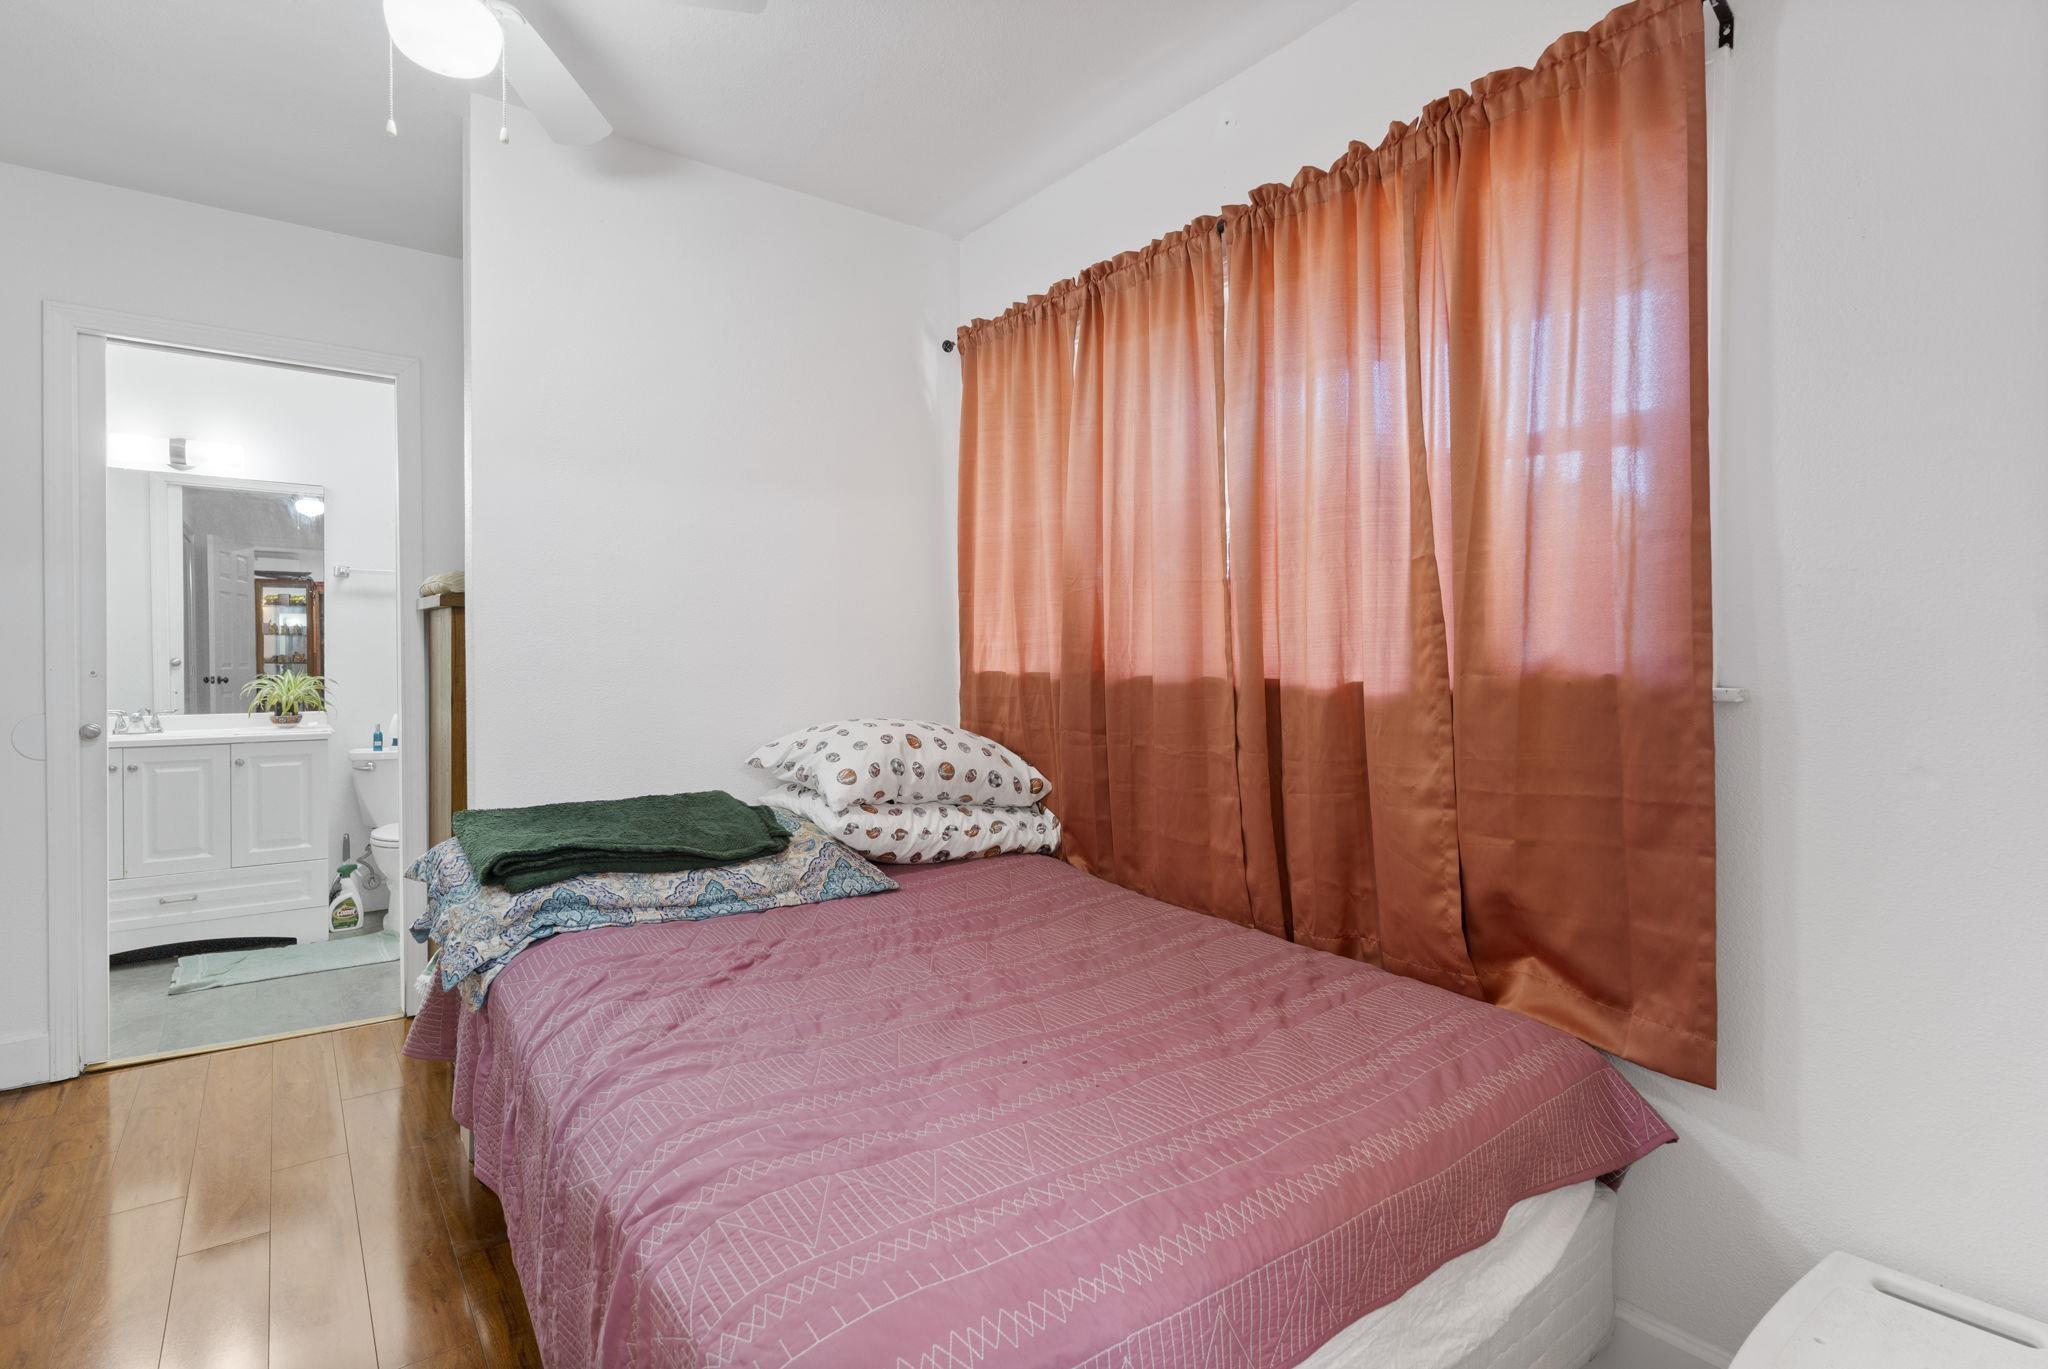 932 Makaala Dr Property Photo 22